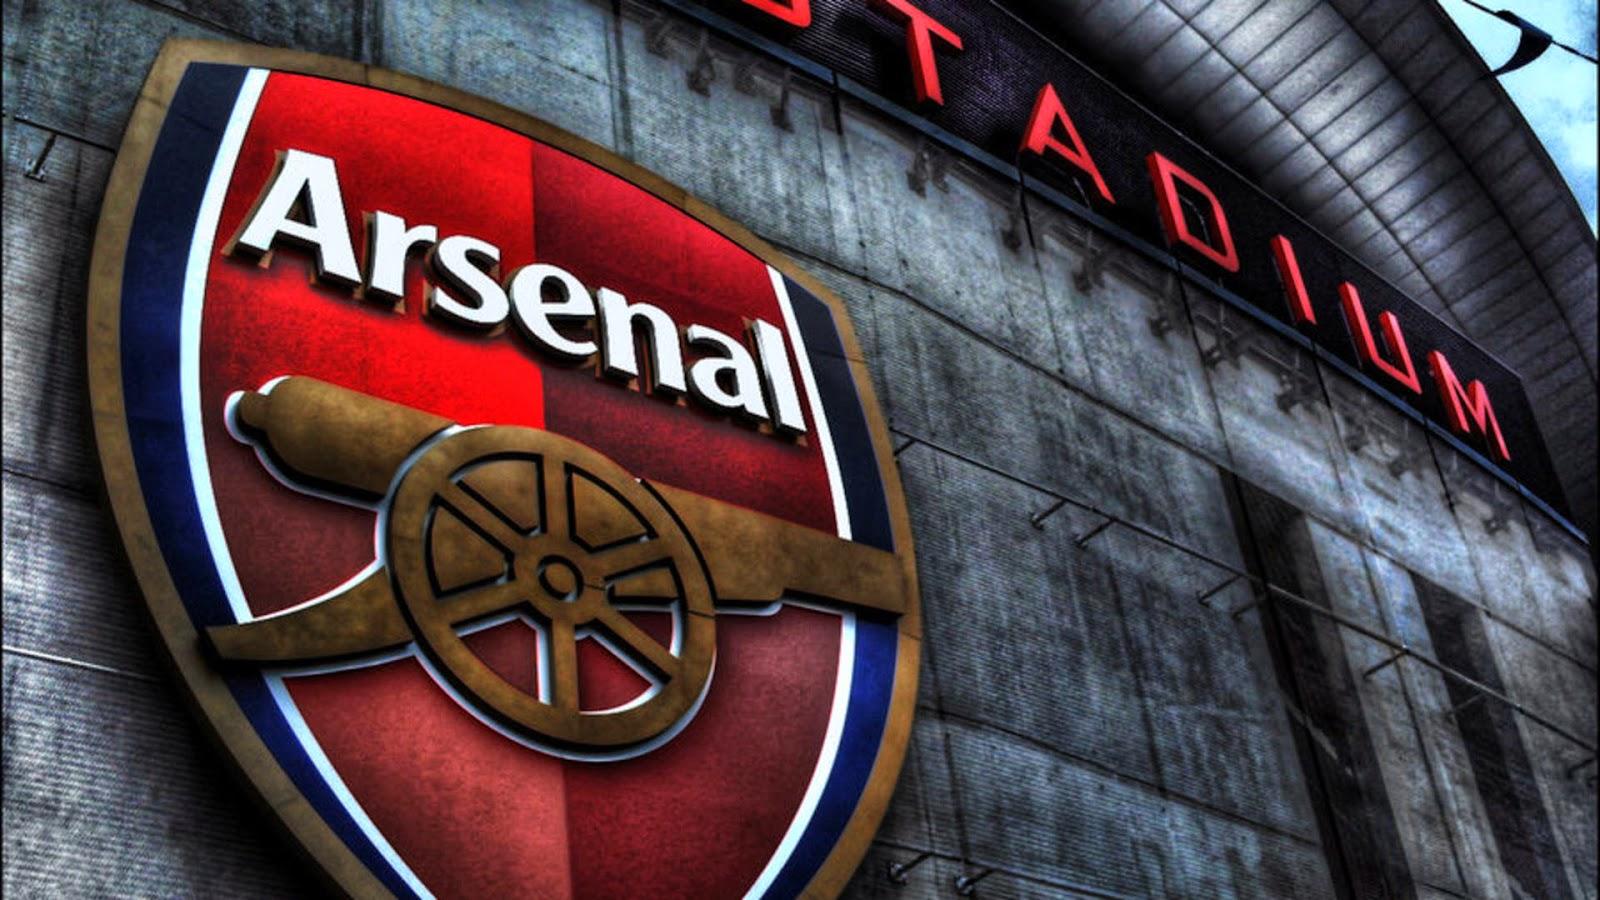 Arsenal Football Club Wallpaper - Football Wallpaper HD  |Arsenal